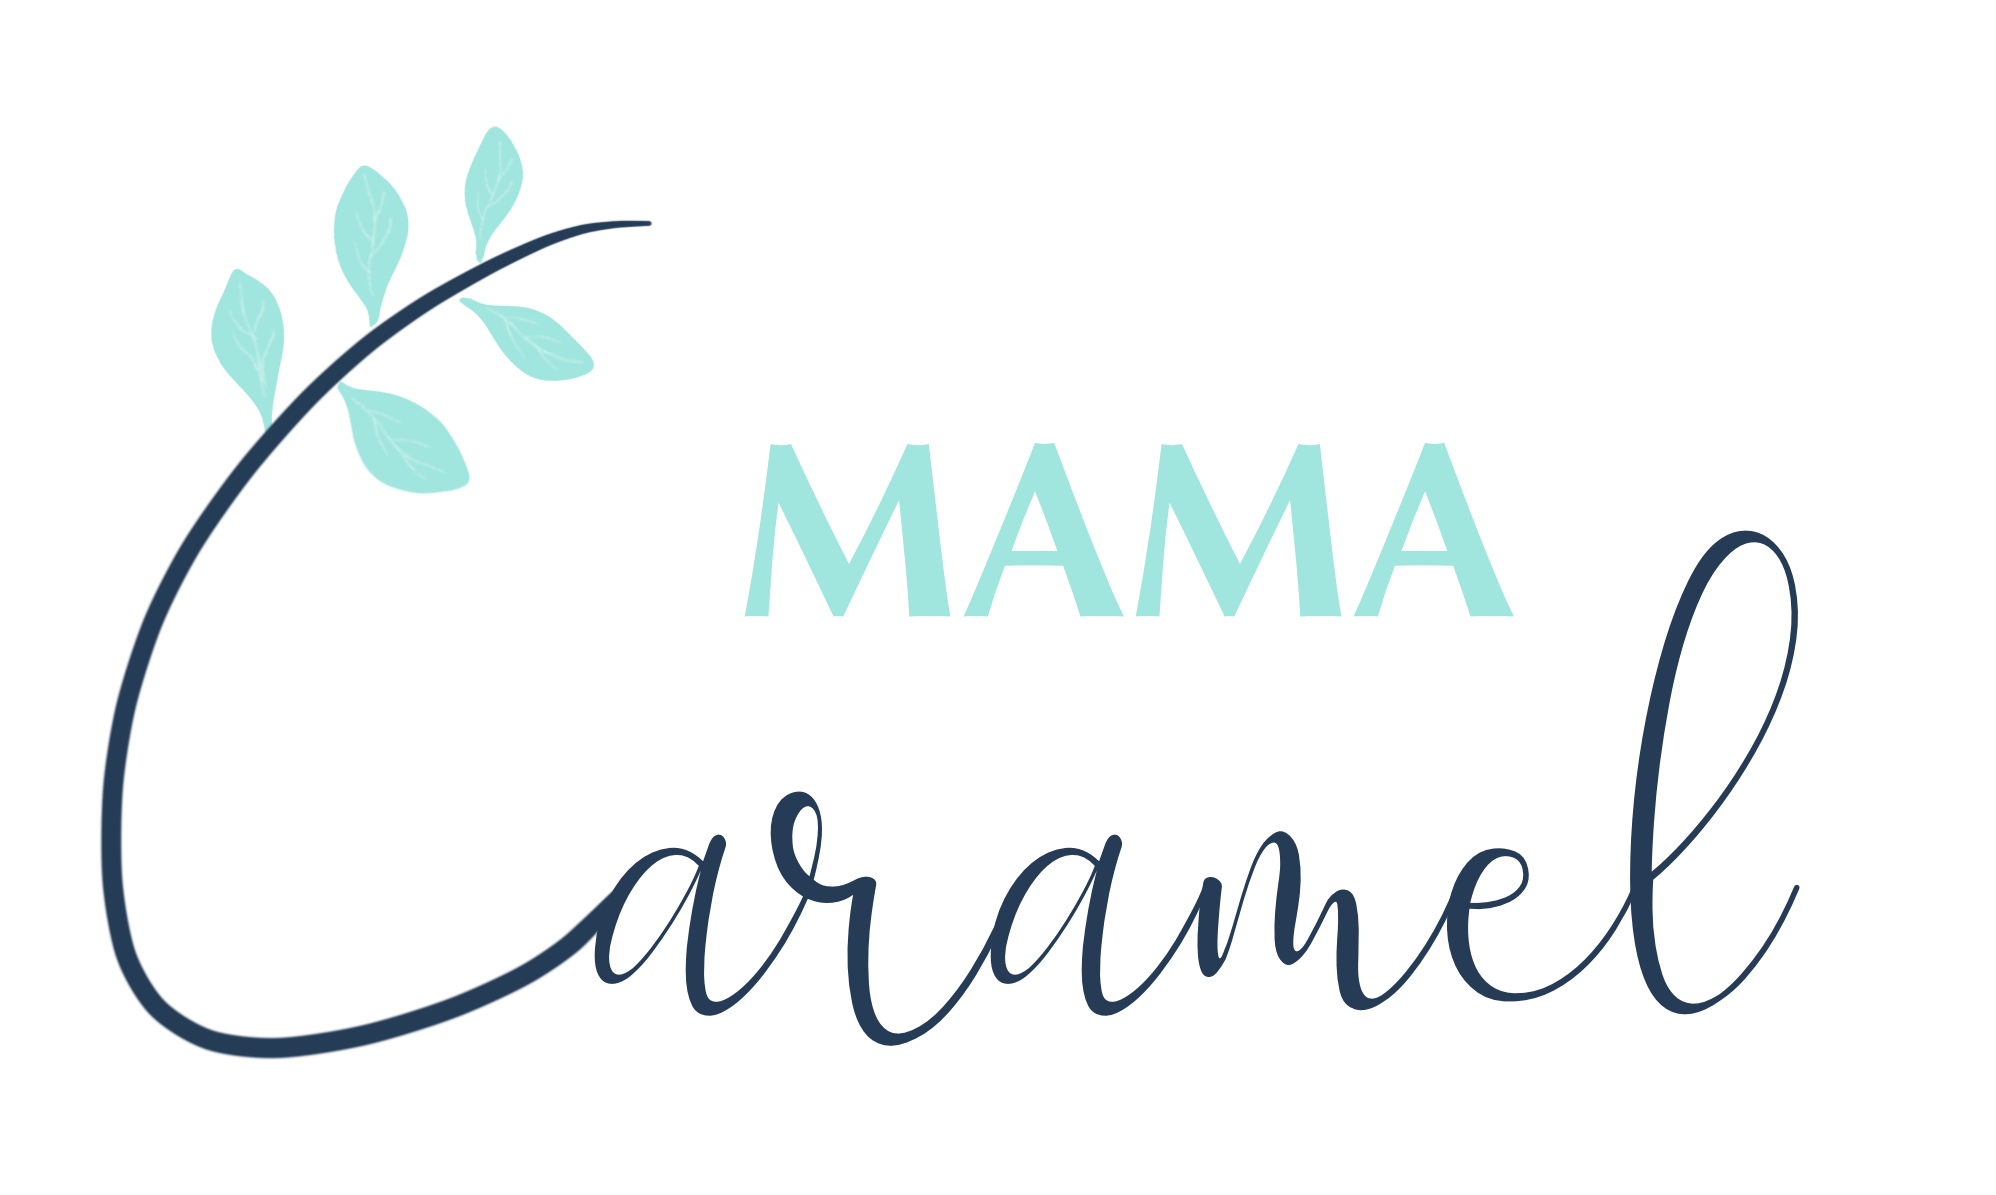 Mama Caramel